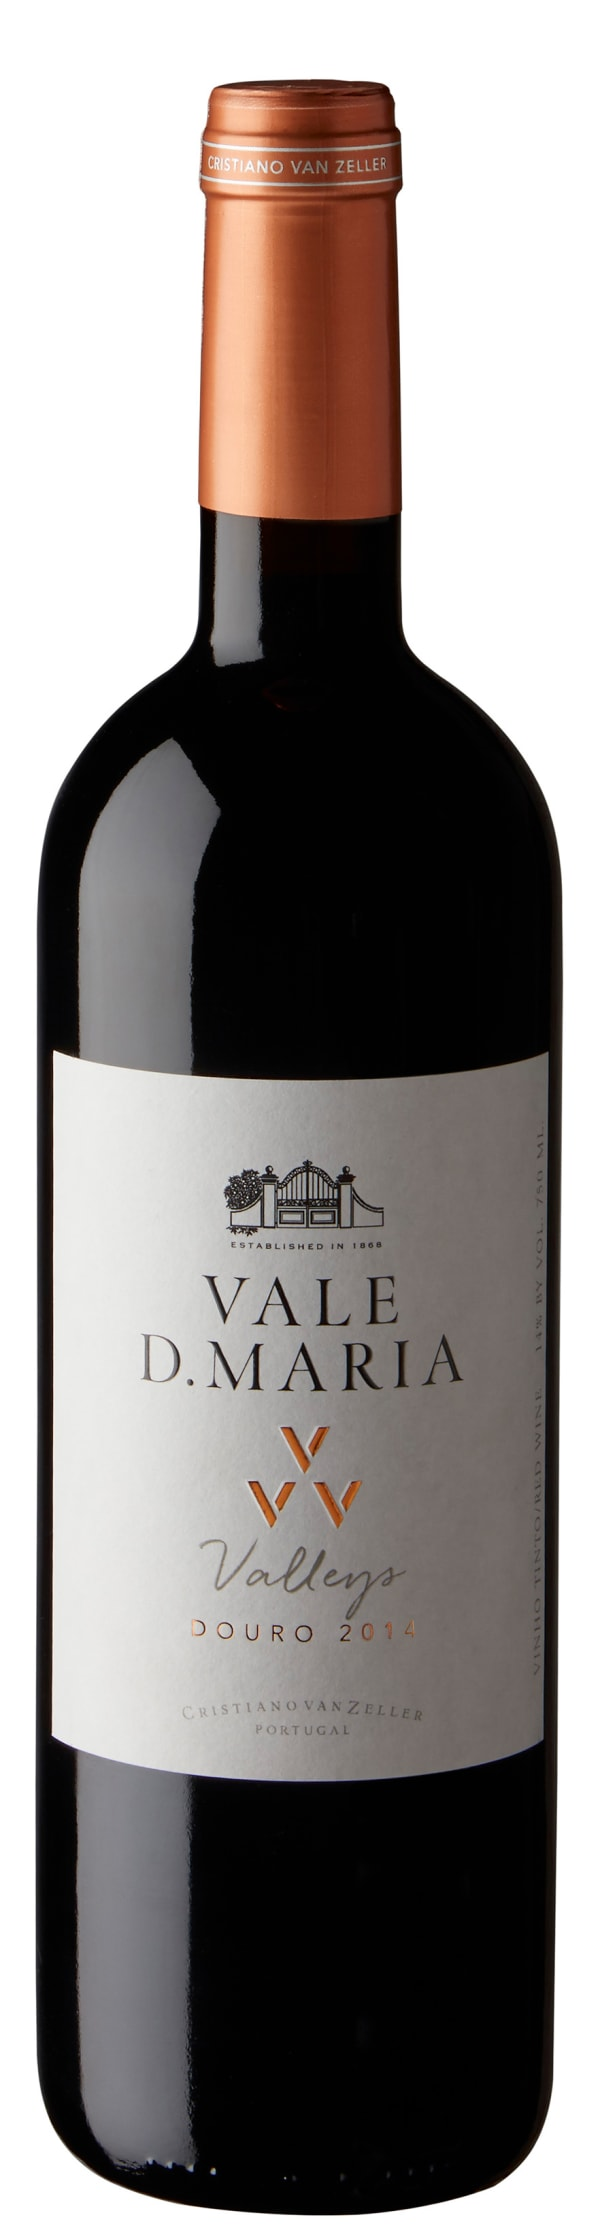 Vale D. Maria VVV Valleys Tinto 2015